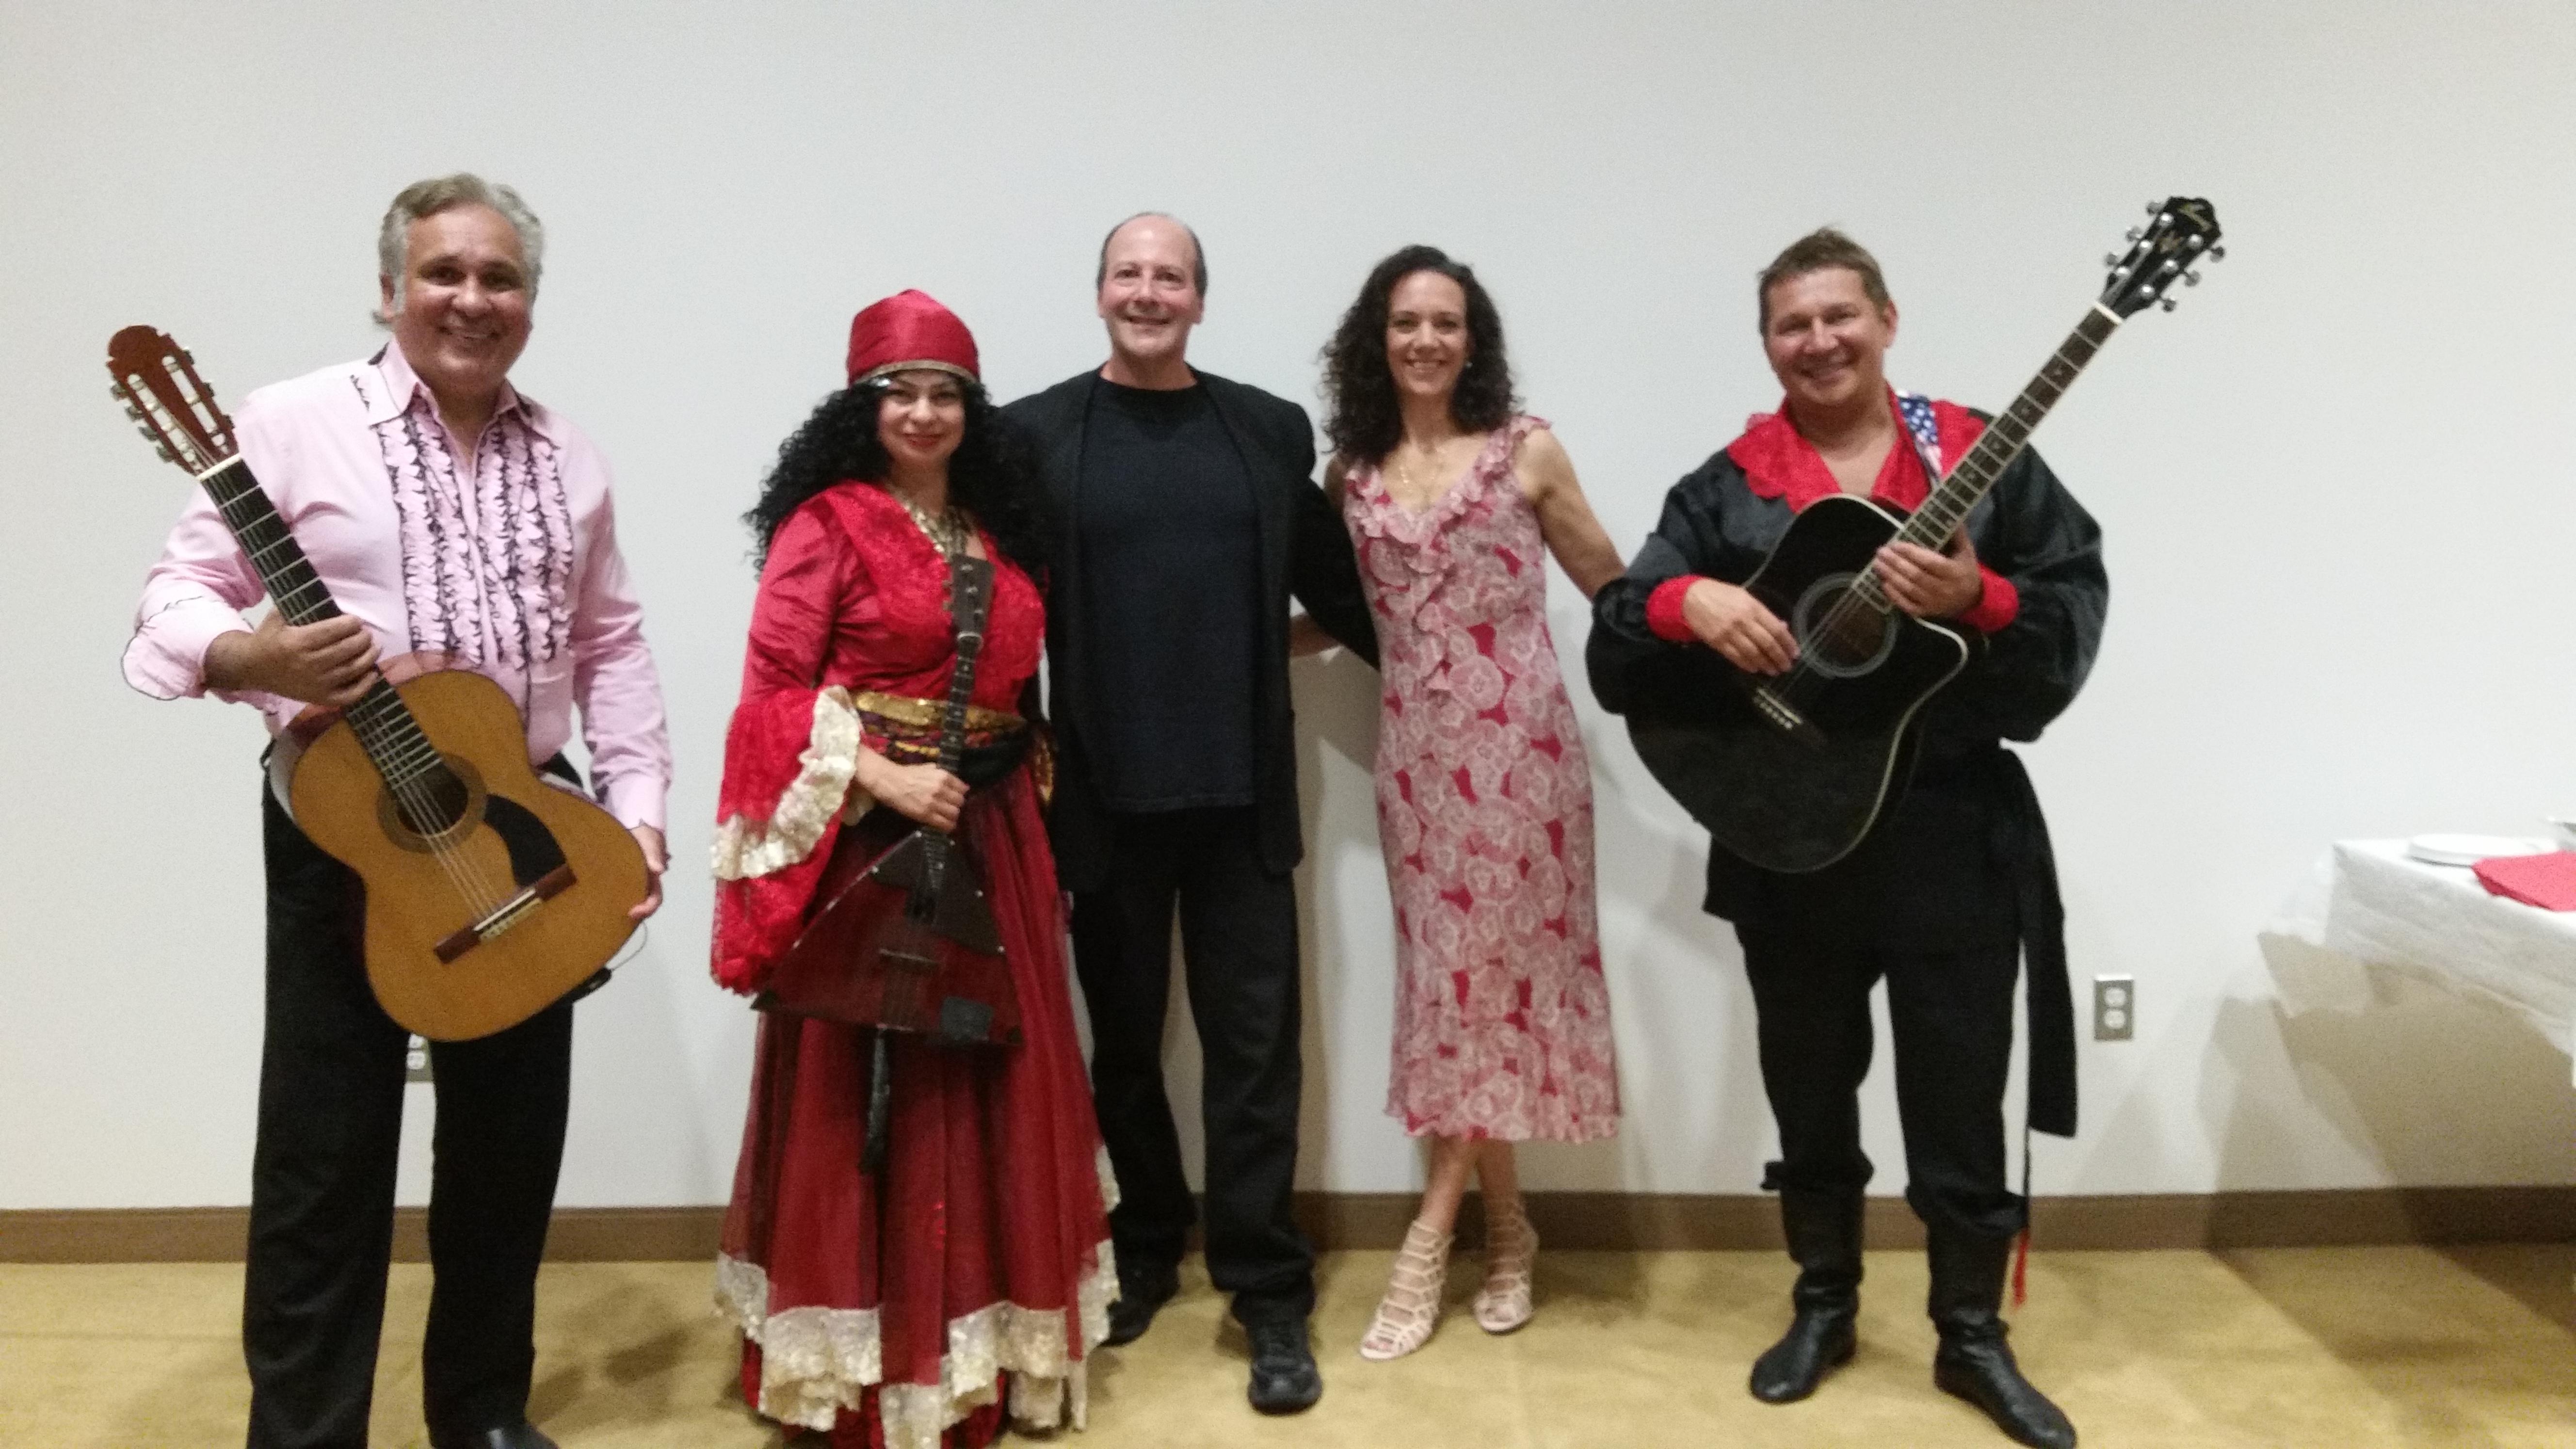 Short Hills, New Jersey  Gypsy, Roma, Tsyganski, Russian music